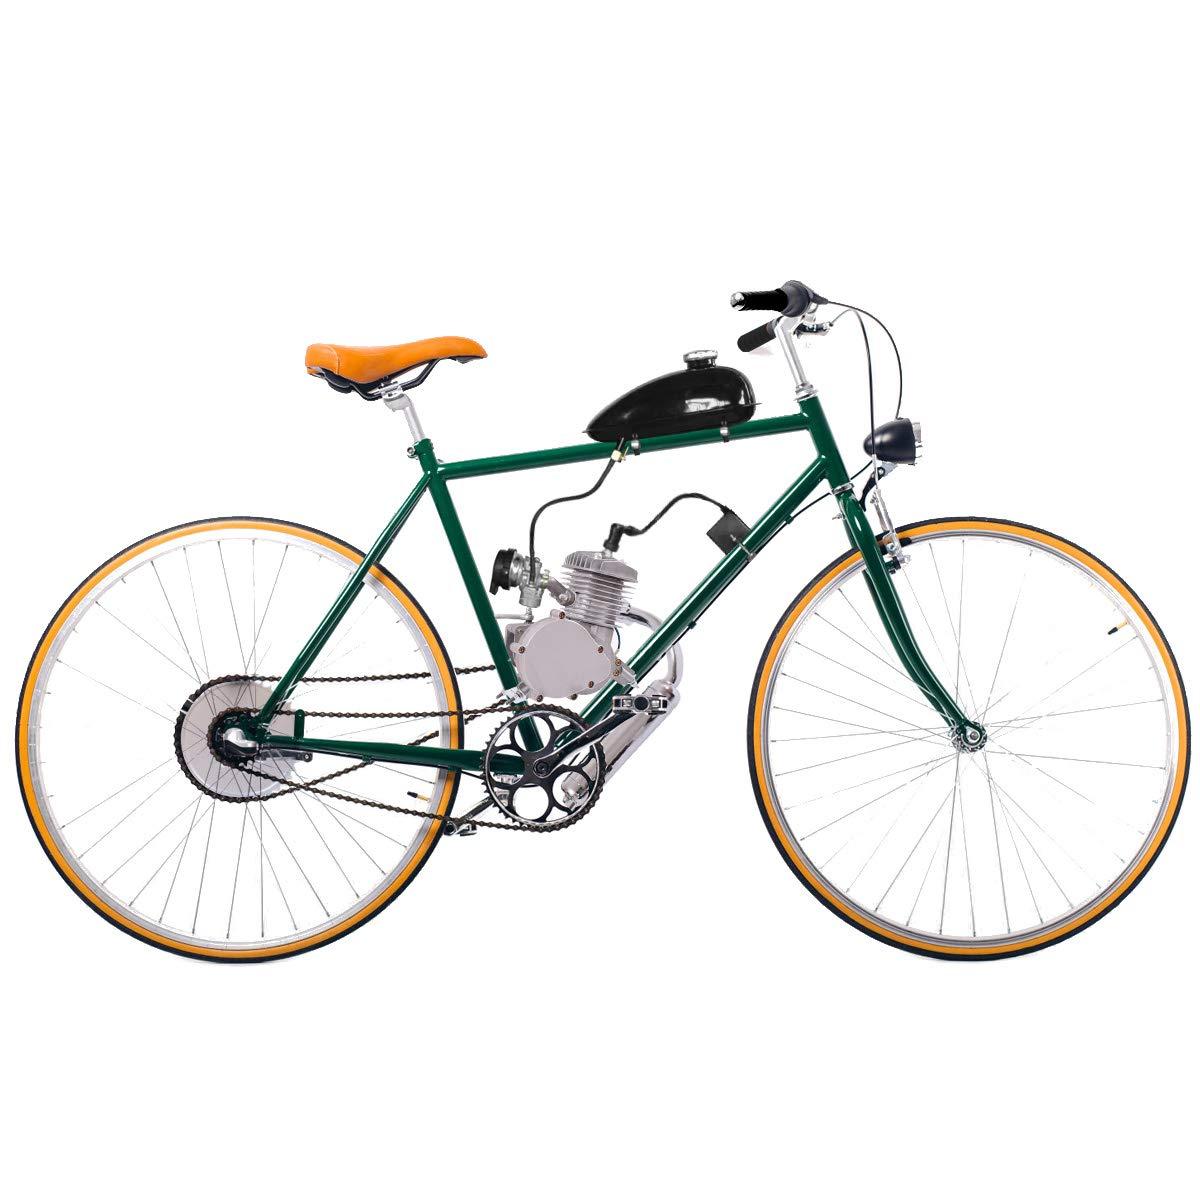 Goplus Motor de la Bicicleta Kit 80cc de 2 Tiempos de Bicicletas ...